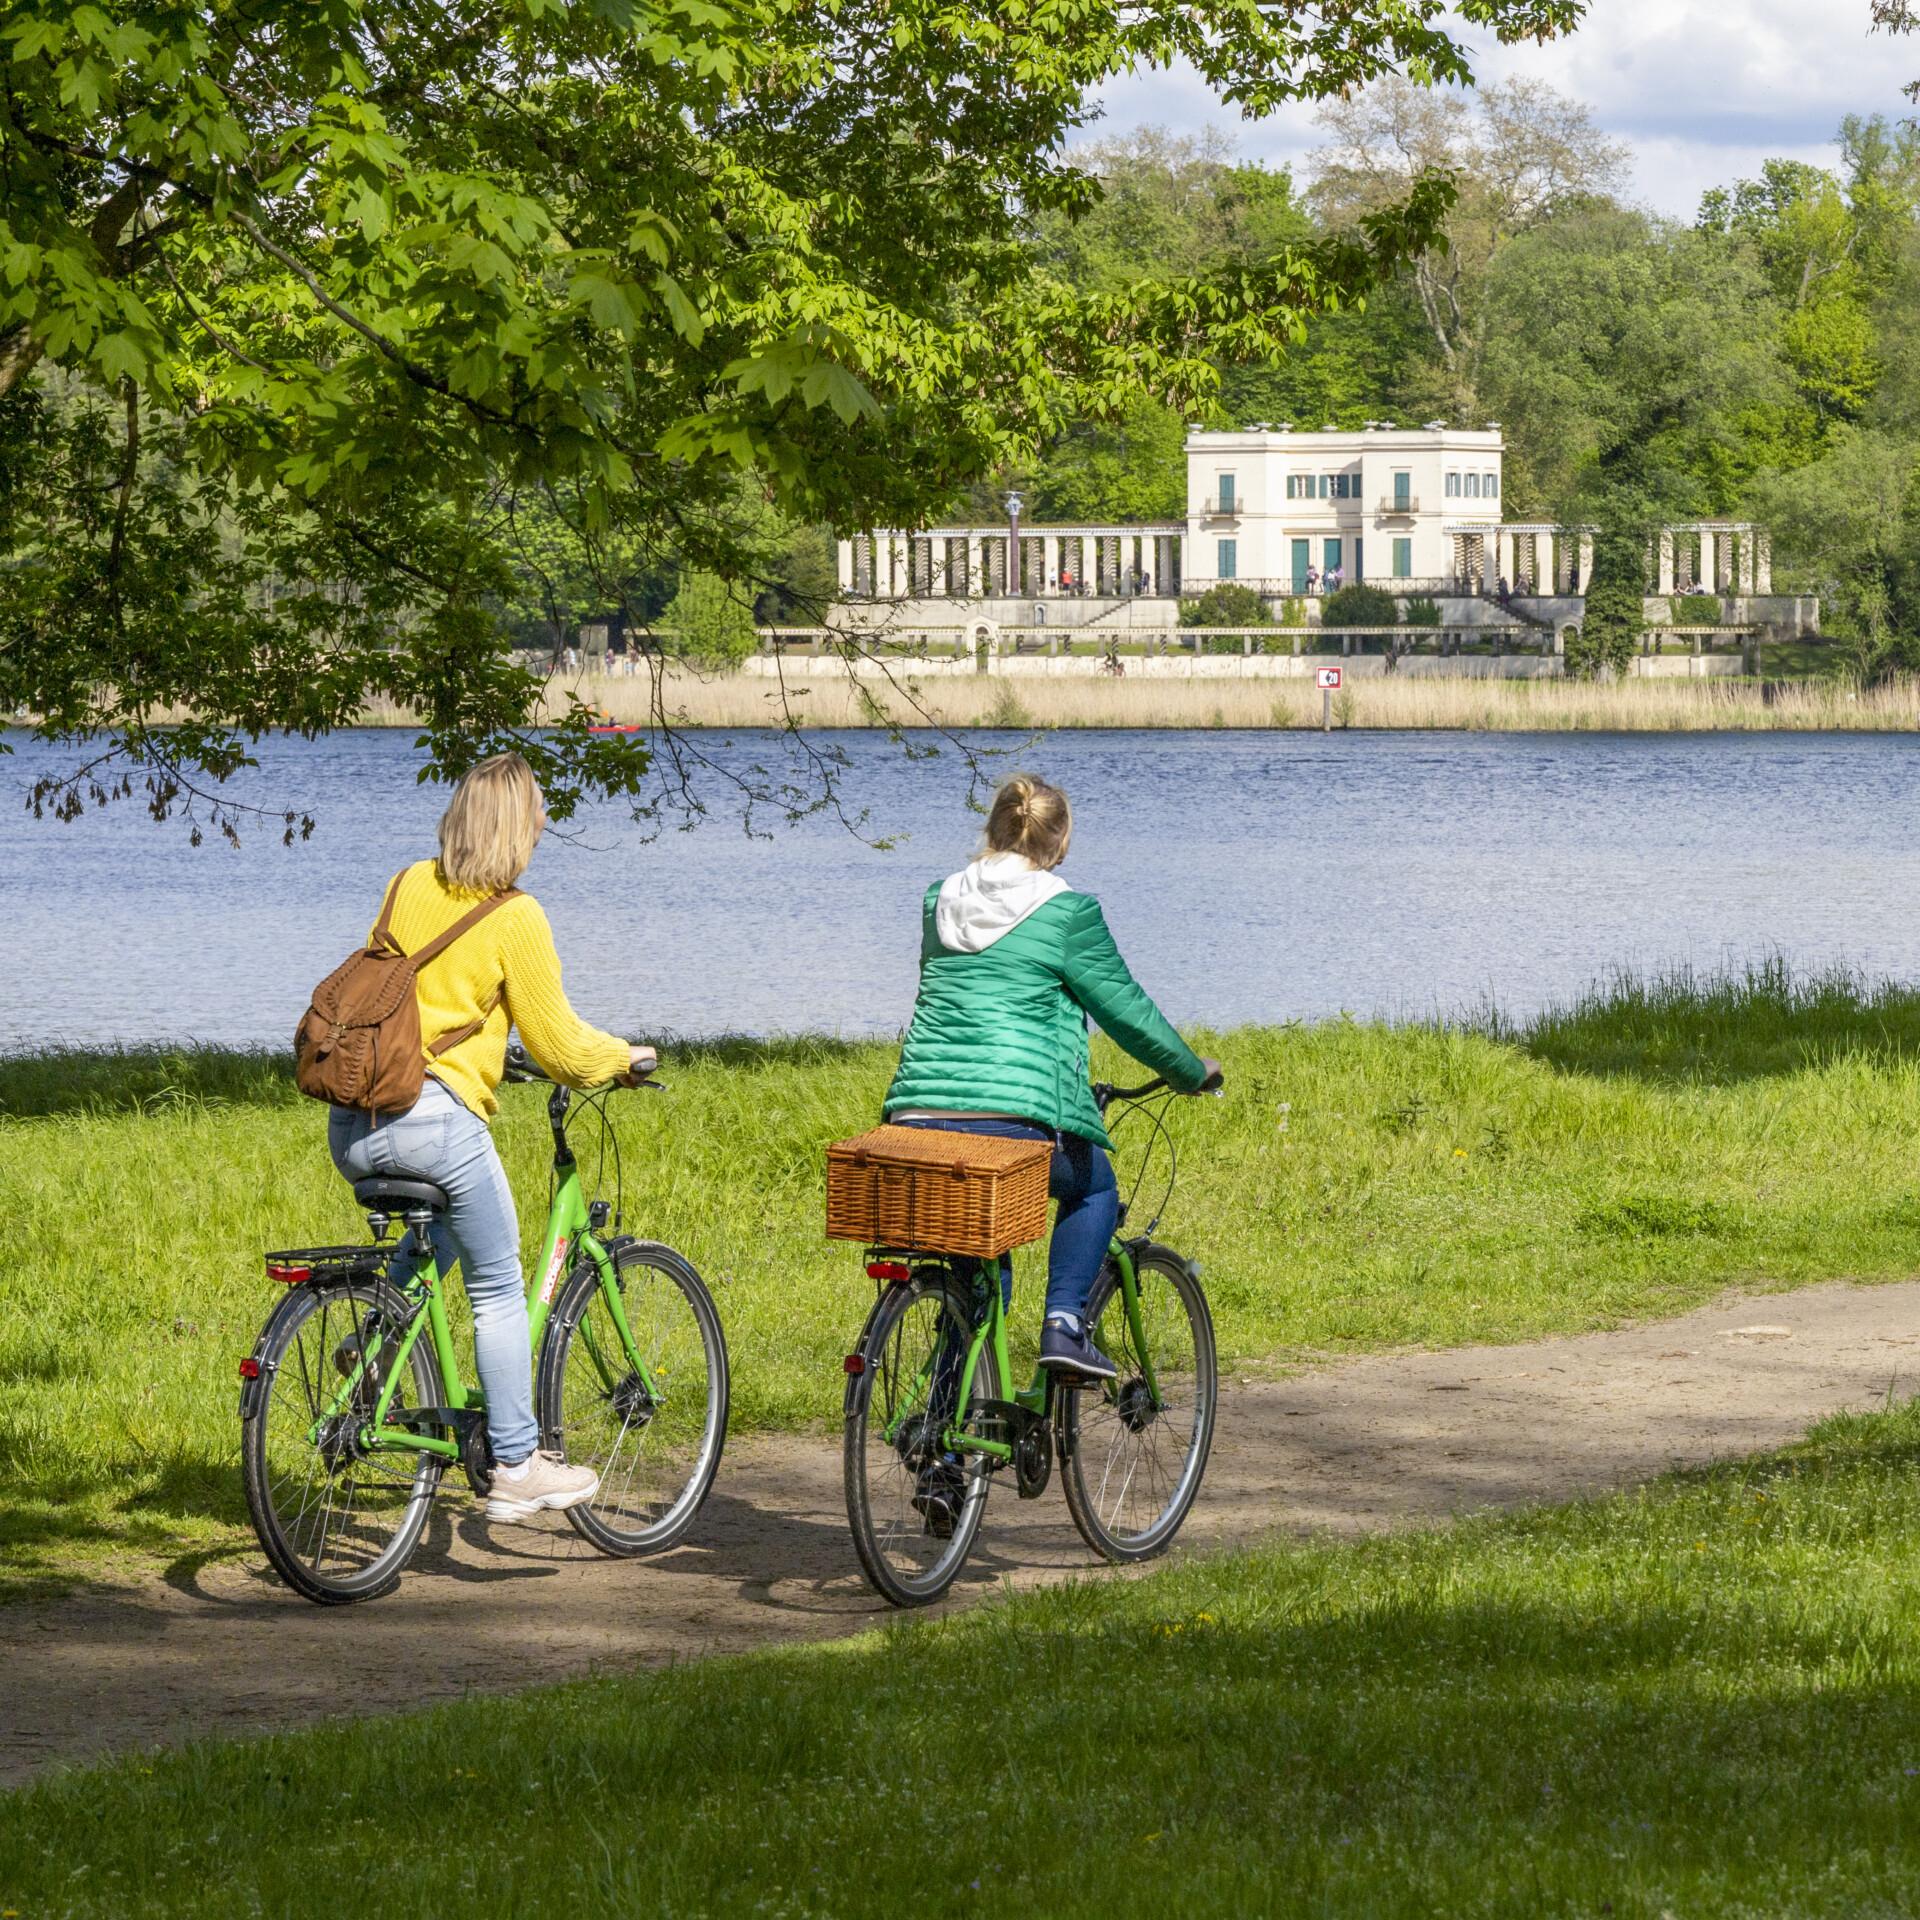 Radtour entlang der Havel, Foto: PMSG/ André Stiebitz